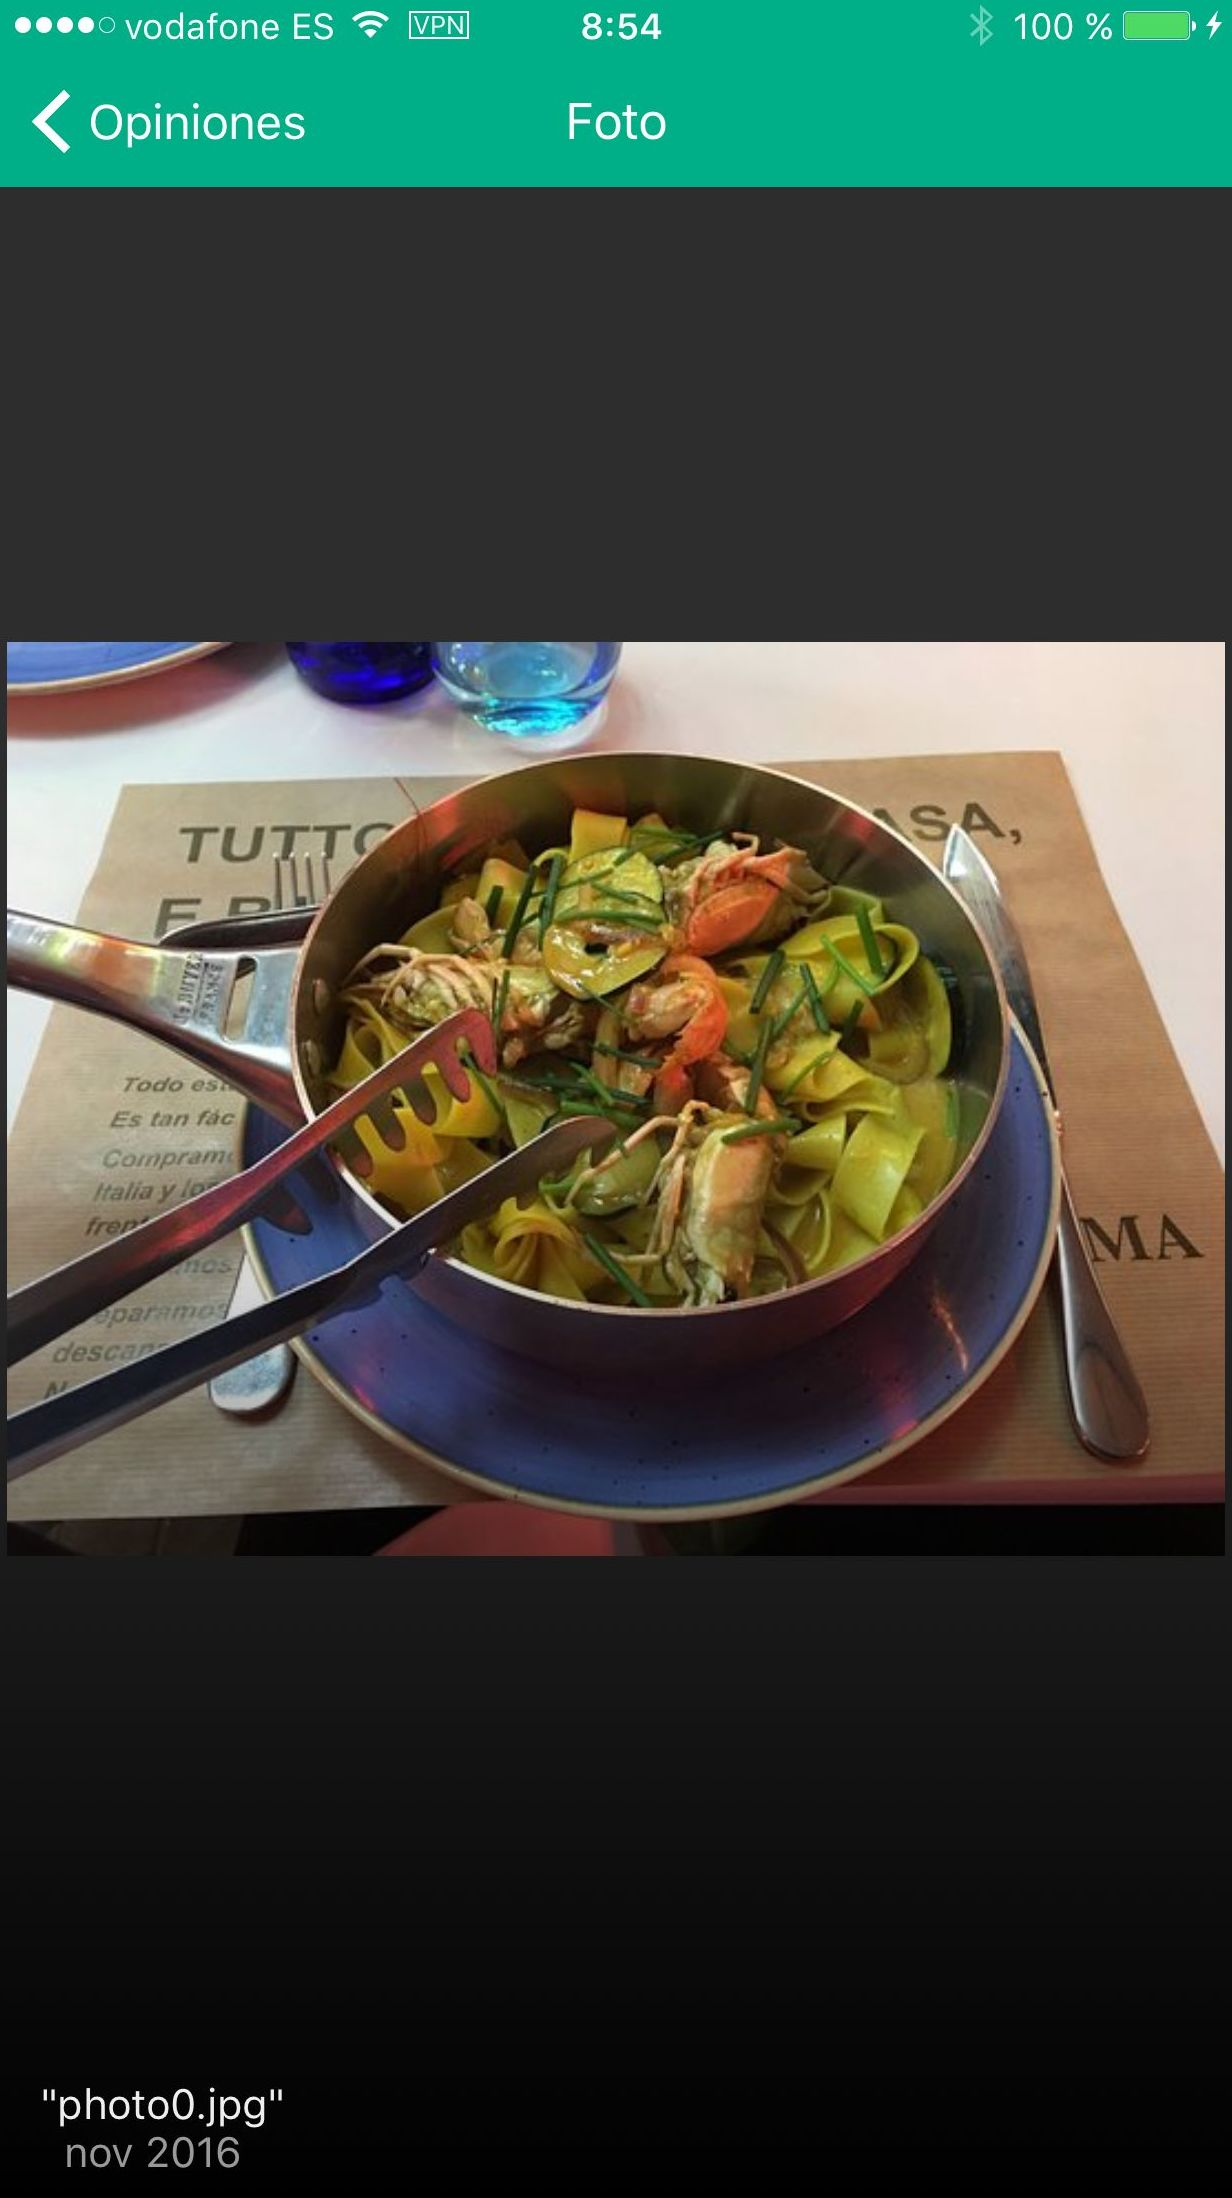 Foto 61 de Cocina italiana en VALENCIA | Pizza Roma